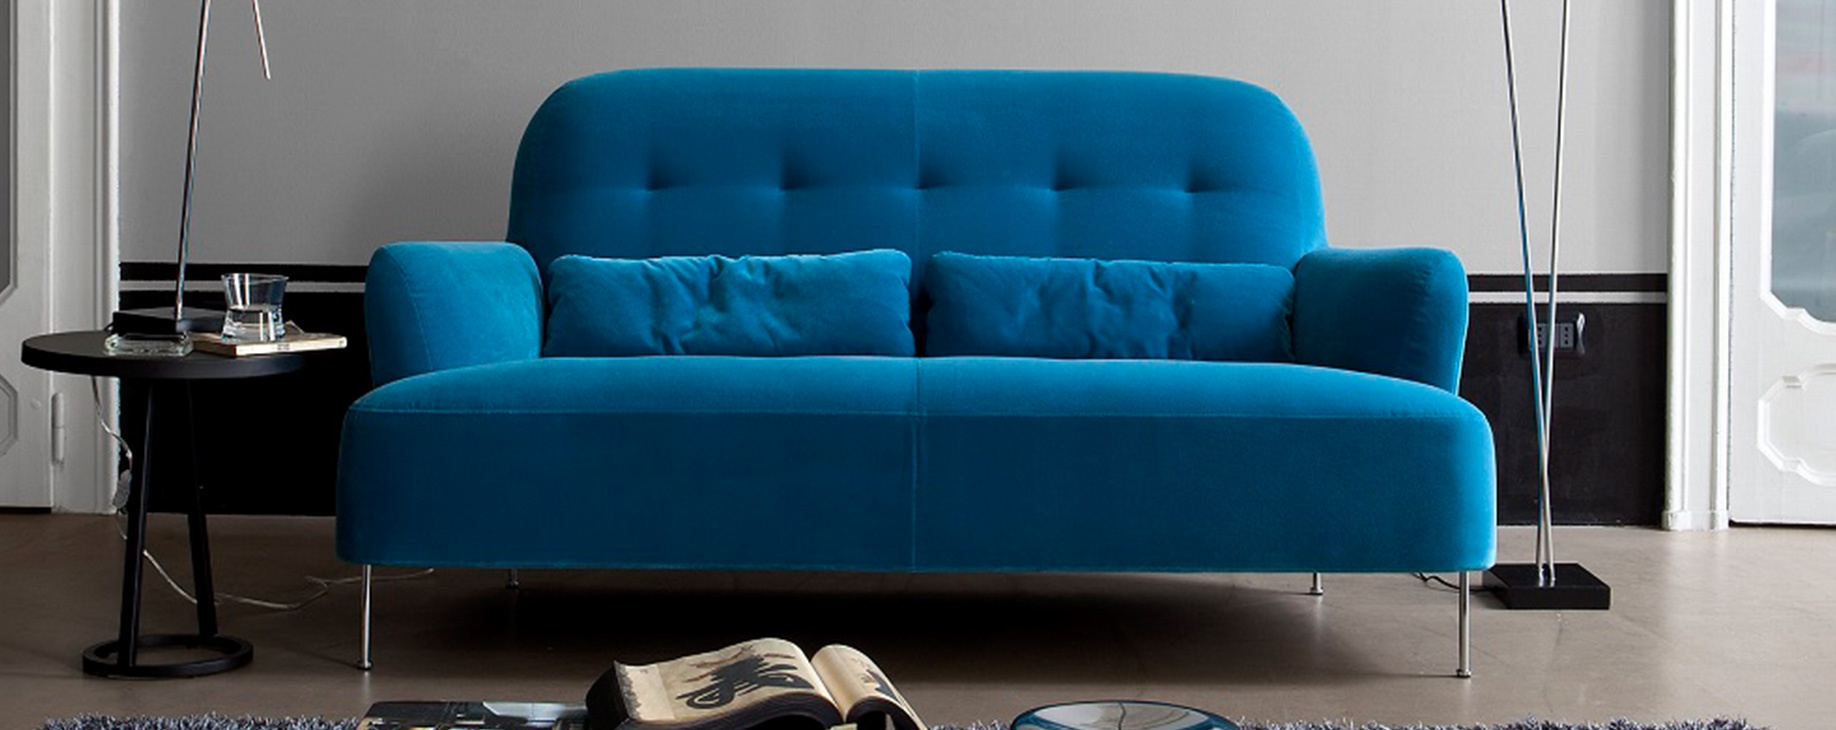 sessel harry ligne roset williamflooring. Black Bedroom Furniture Sets. Home Design Ideas